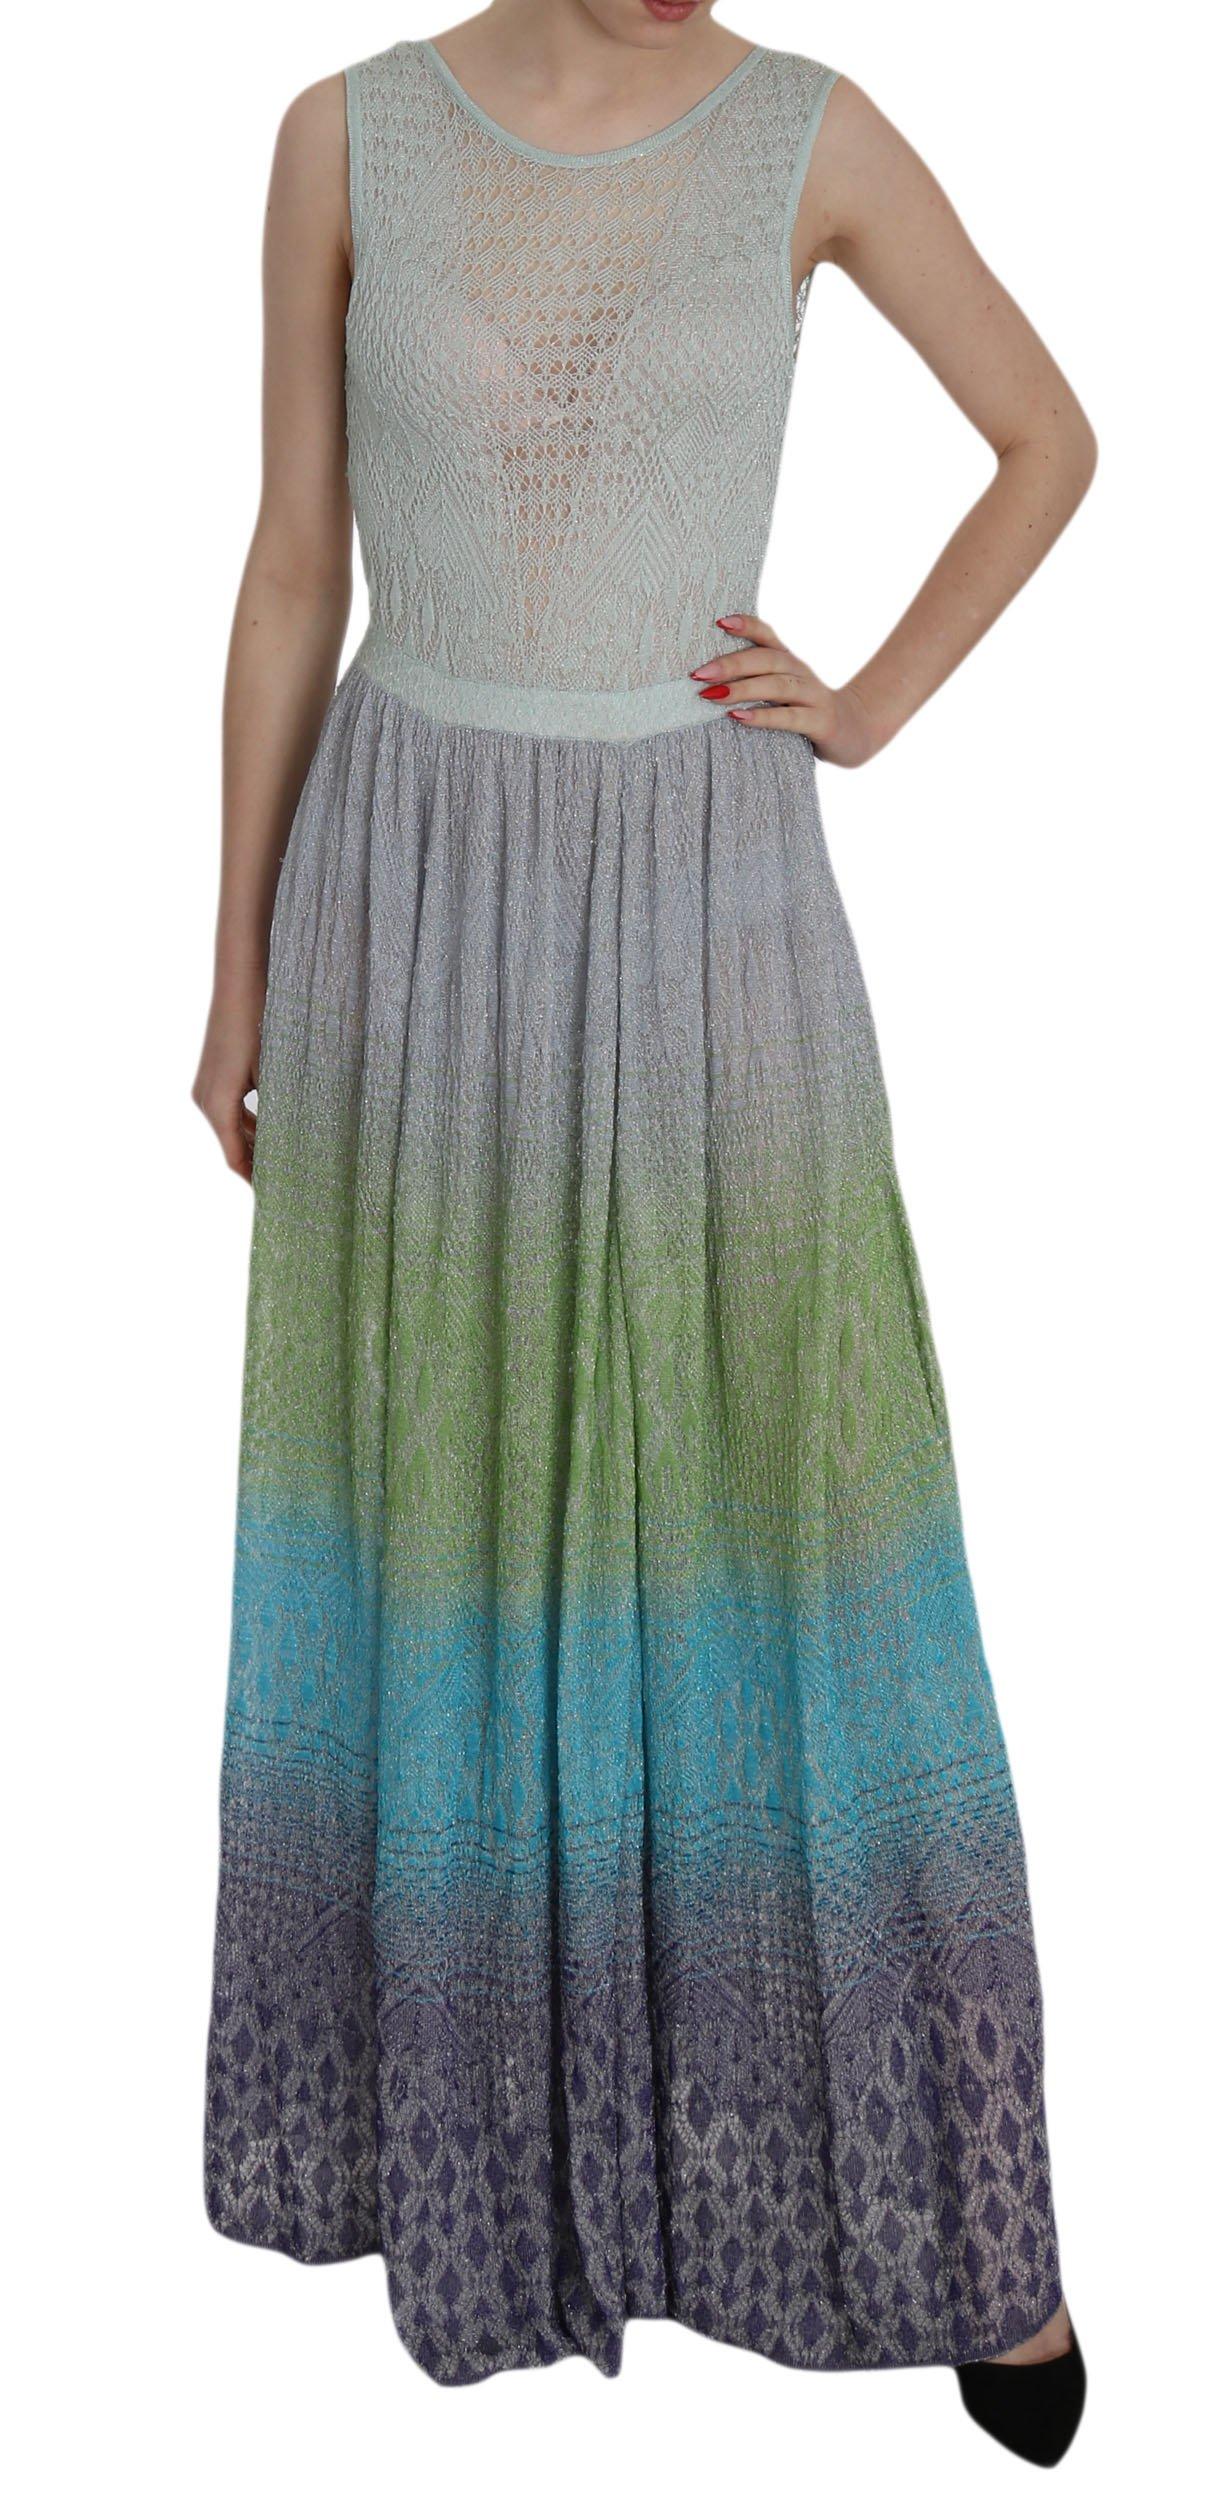 Missoni Women's See Through Donna Dress Multicolor DR1986 - IT42|M